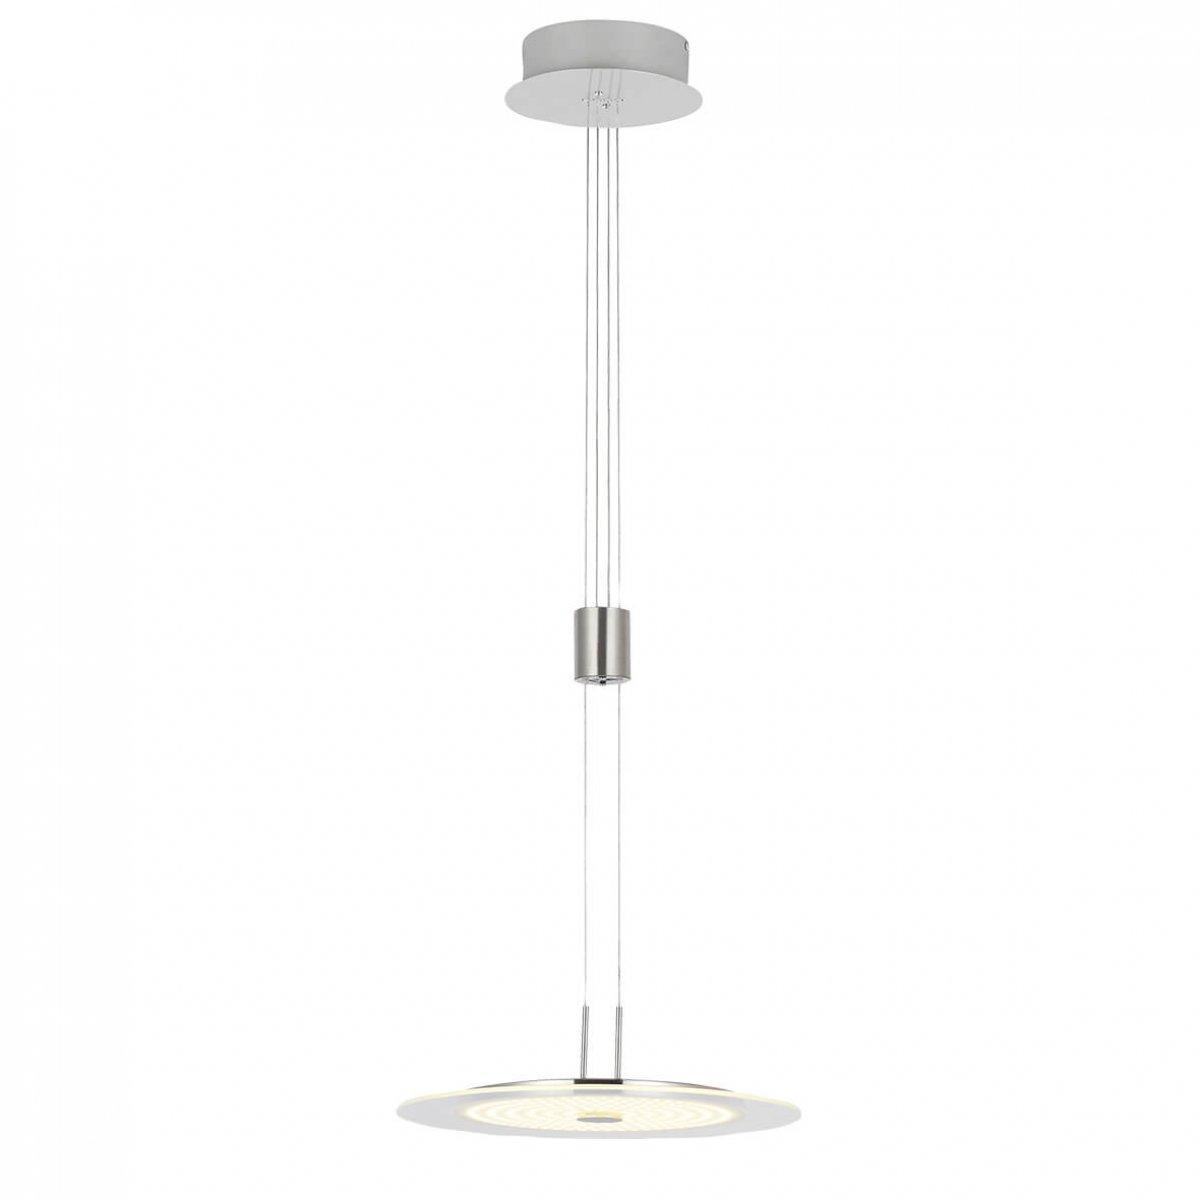 wofi leuchten led pendelleuchte roma nickel matt chrom 1. Black Bedroom Furniture Sets. Home Design Ideas